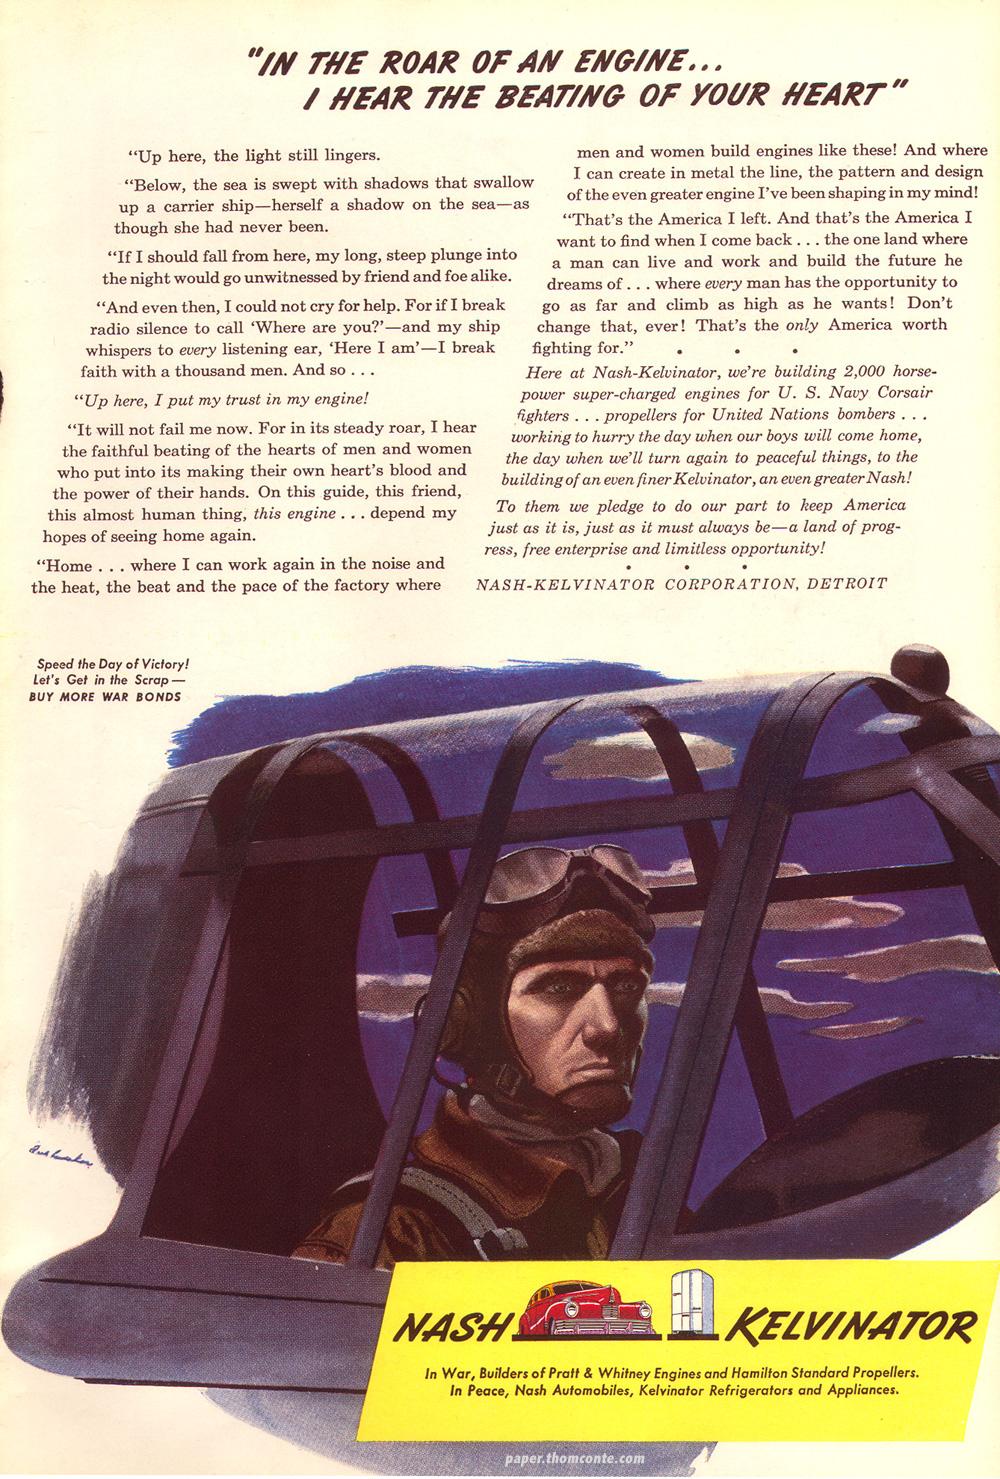 Nash Kelvinator war time advertisement